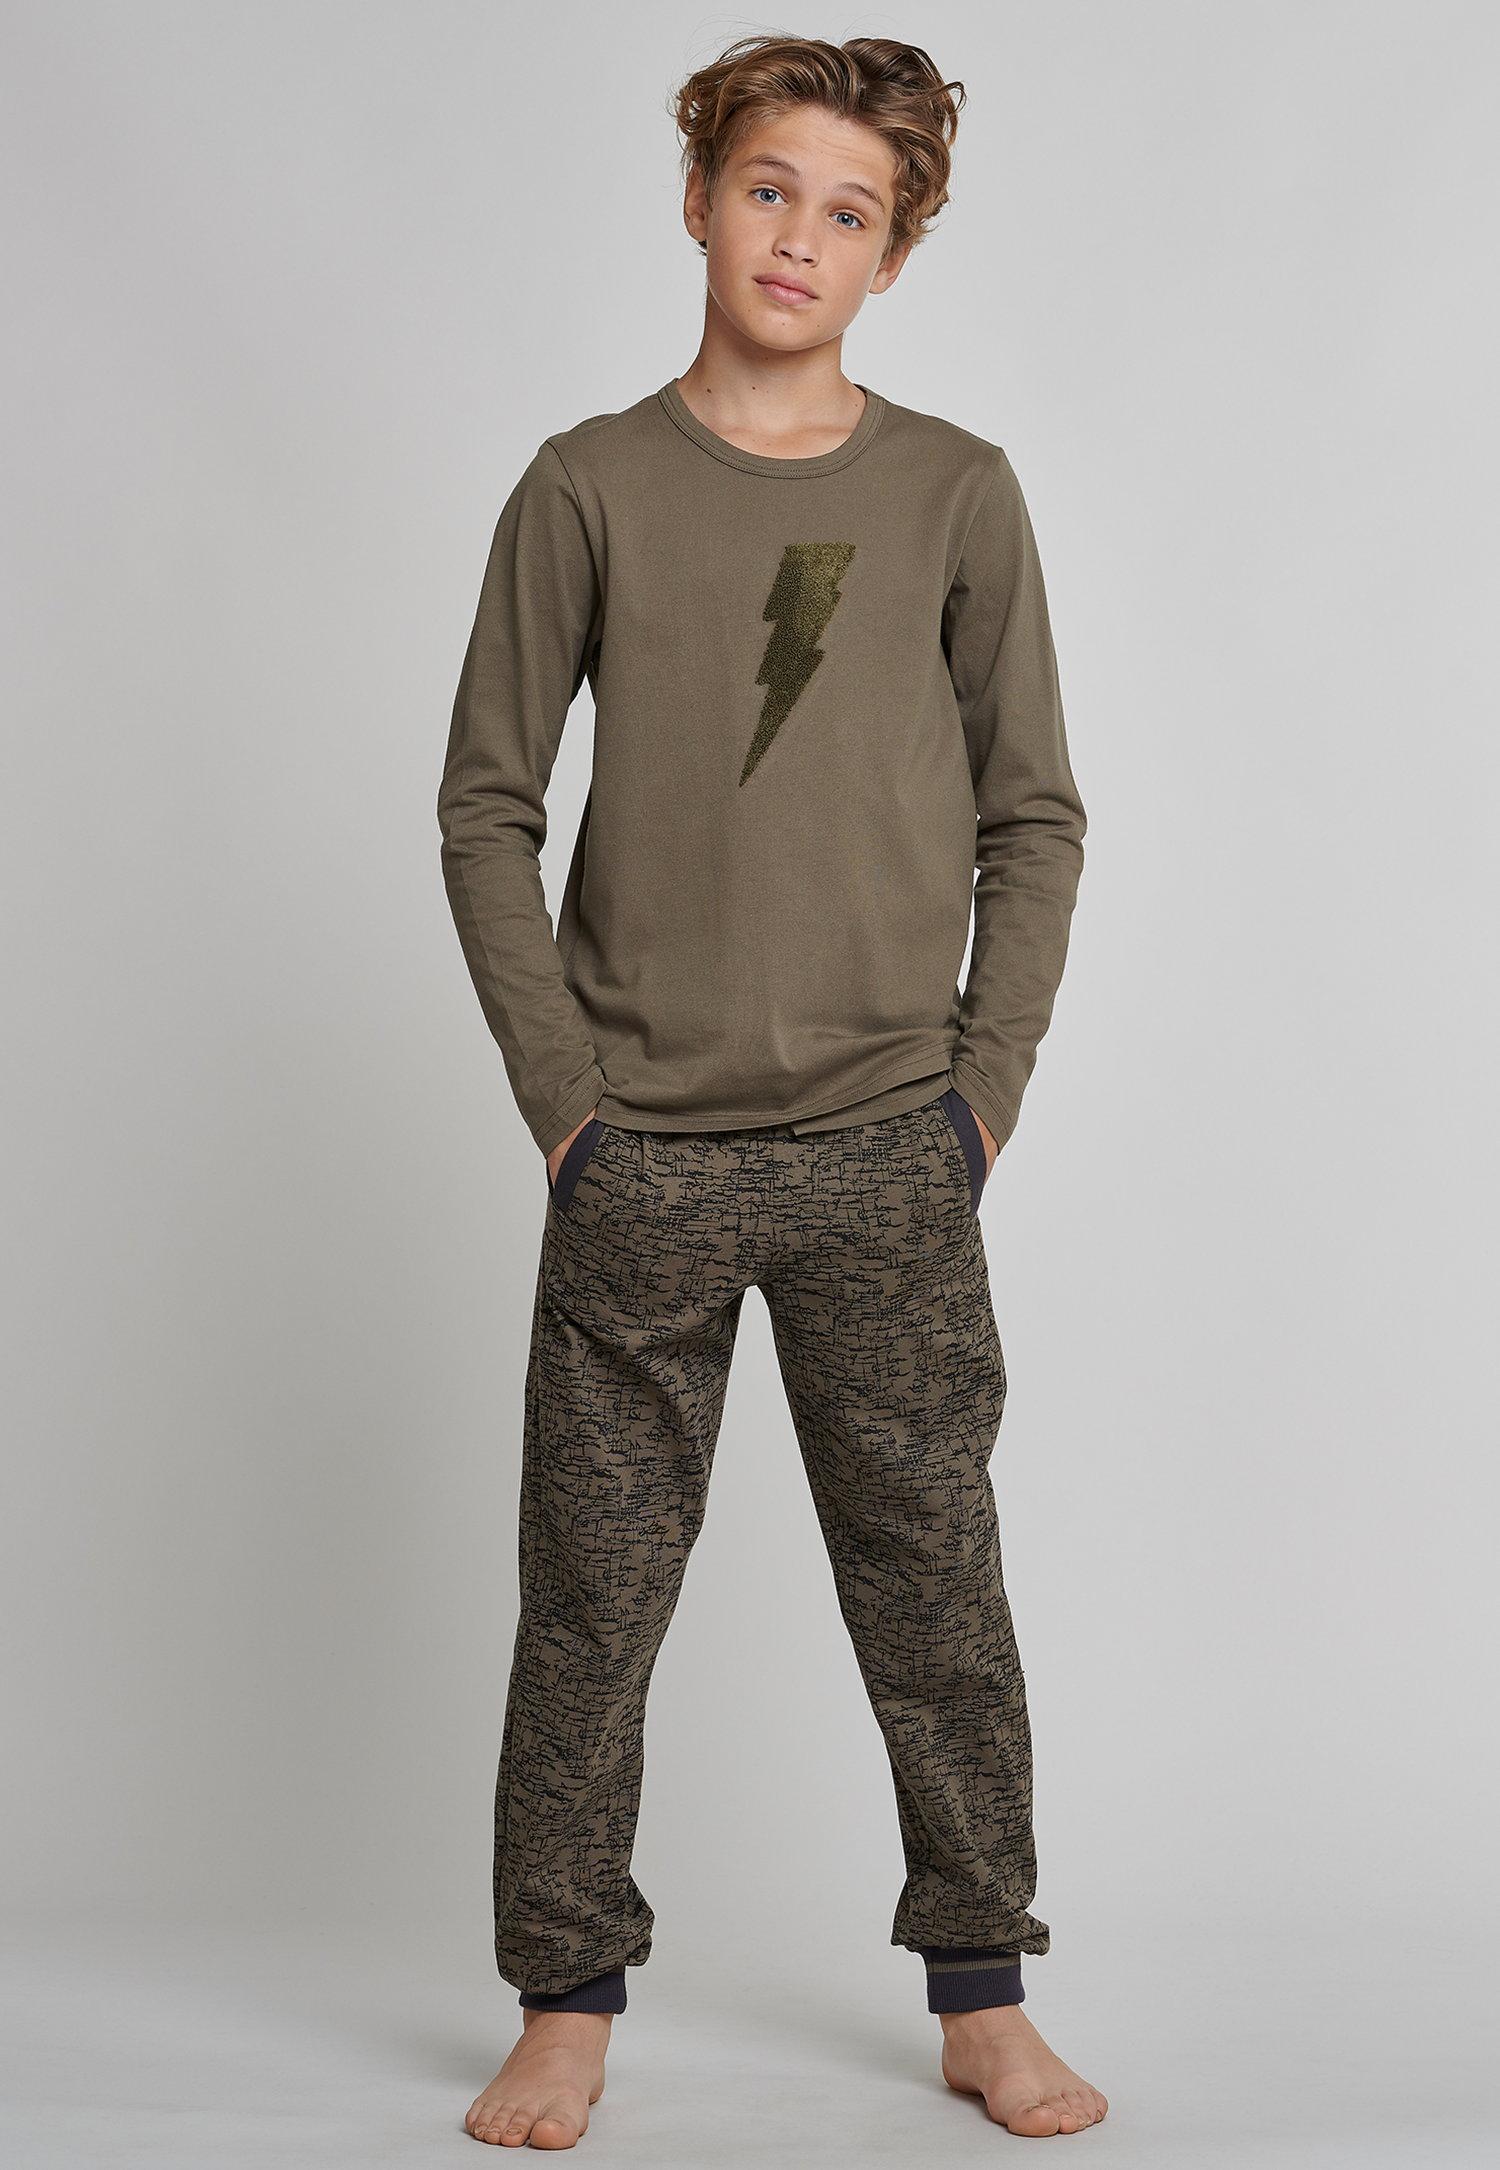 Schiesser Garçons décortiquer-pyjama série Mix /& Relax Olive Gratuit Sac à dos